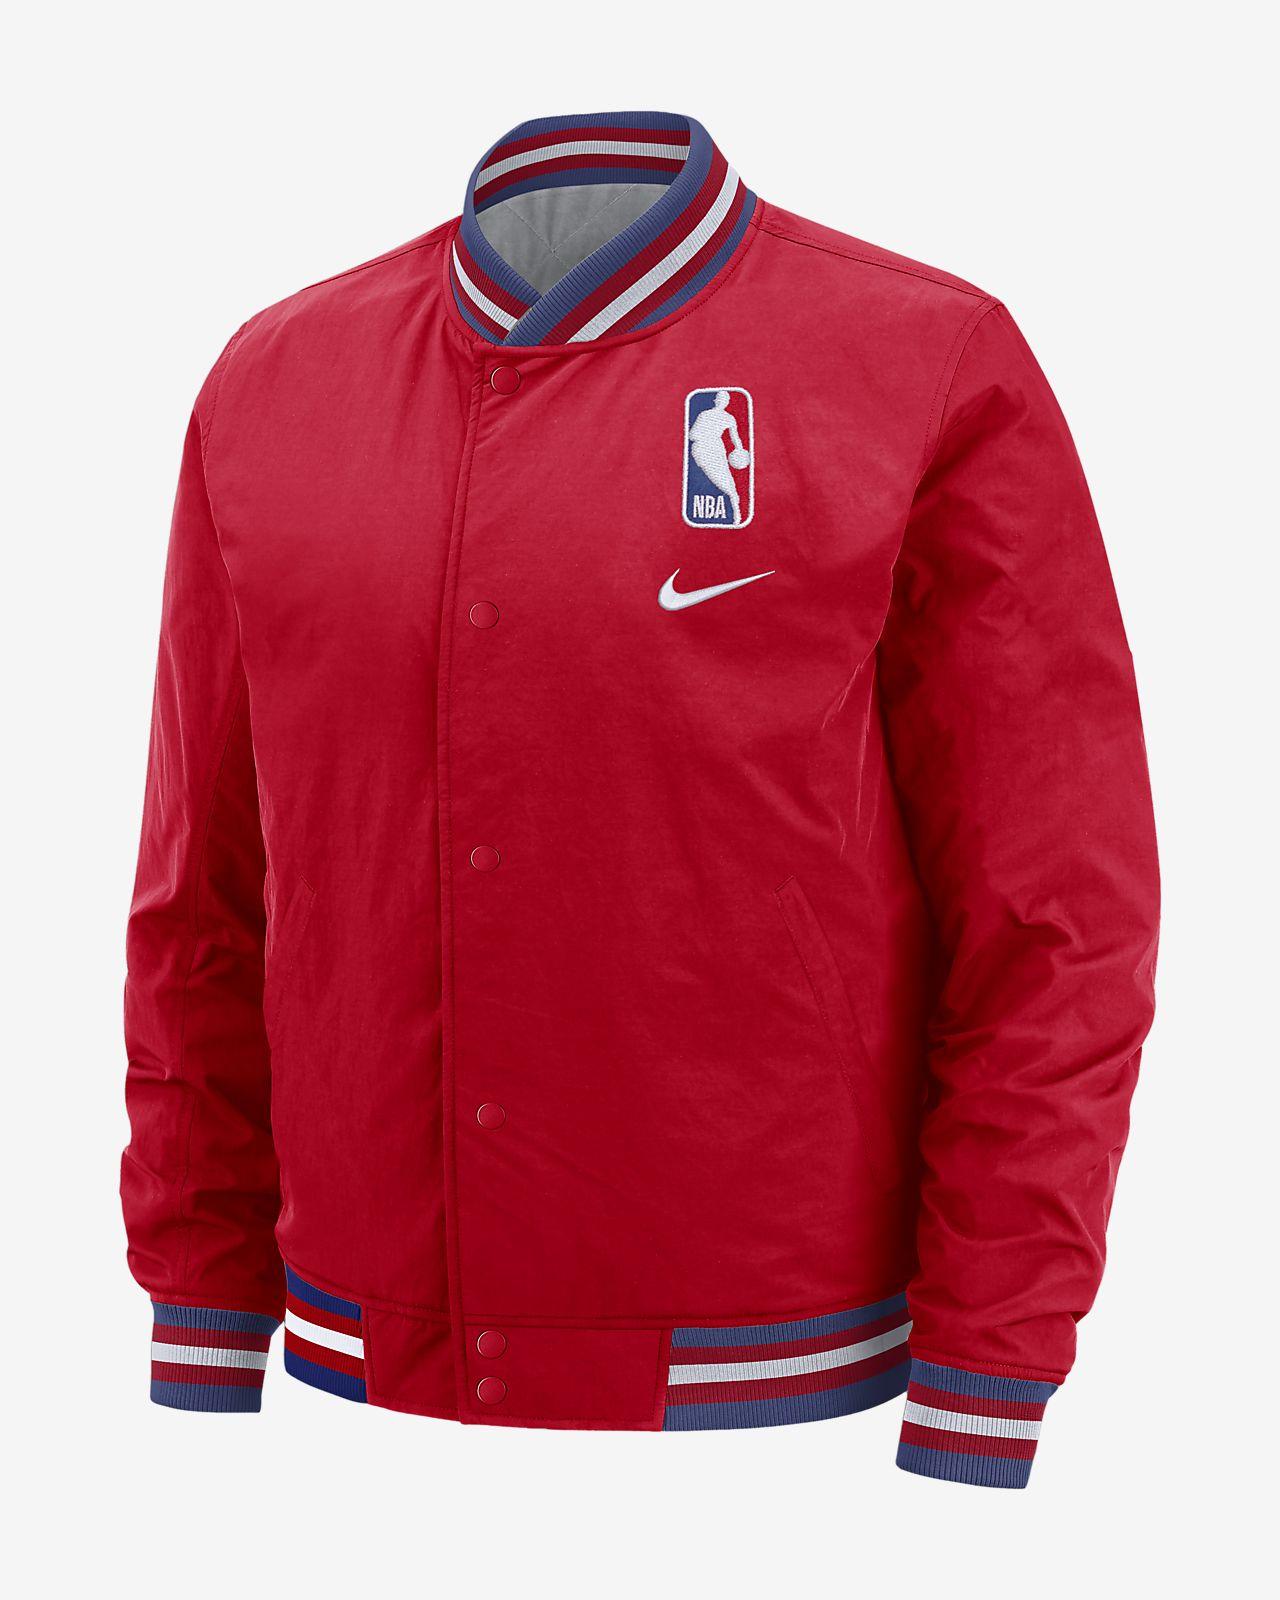 Team 31 Courtside Nike NBA-s férfikabát